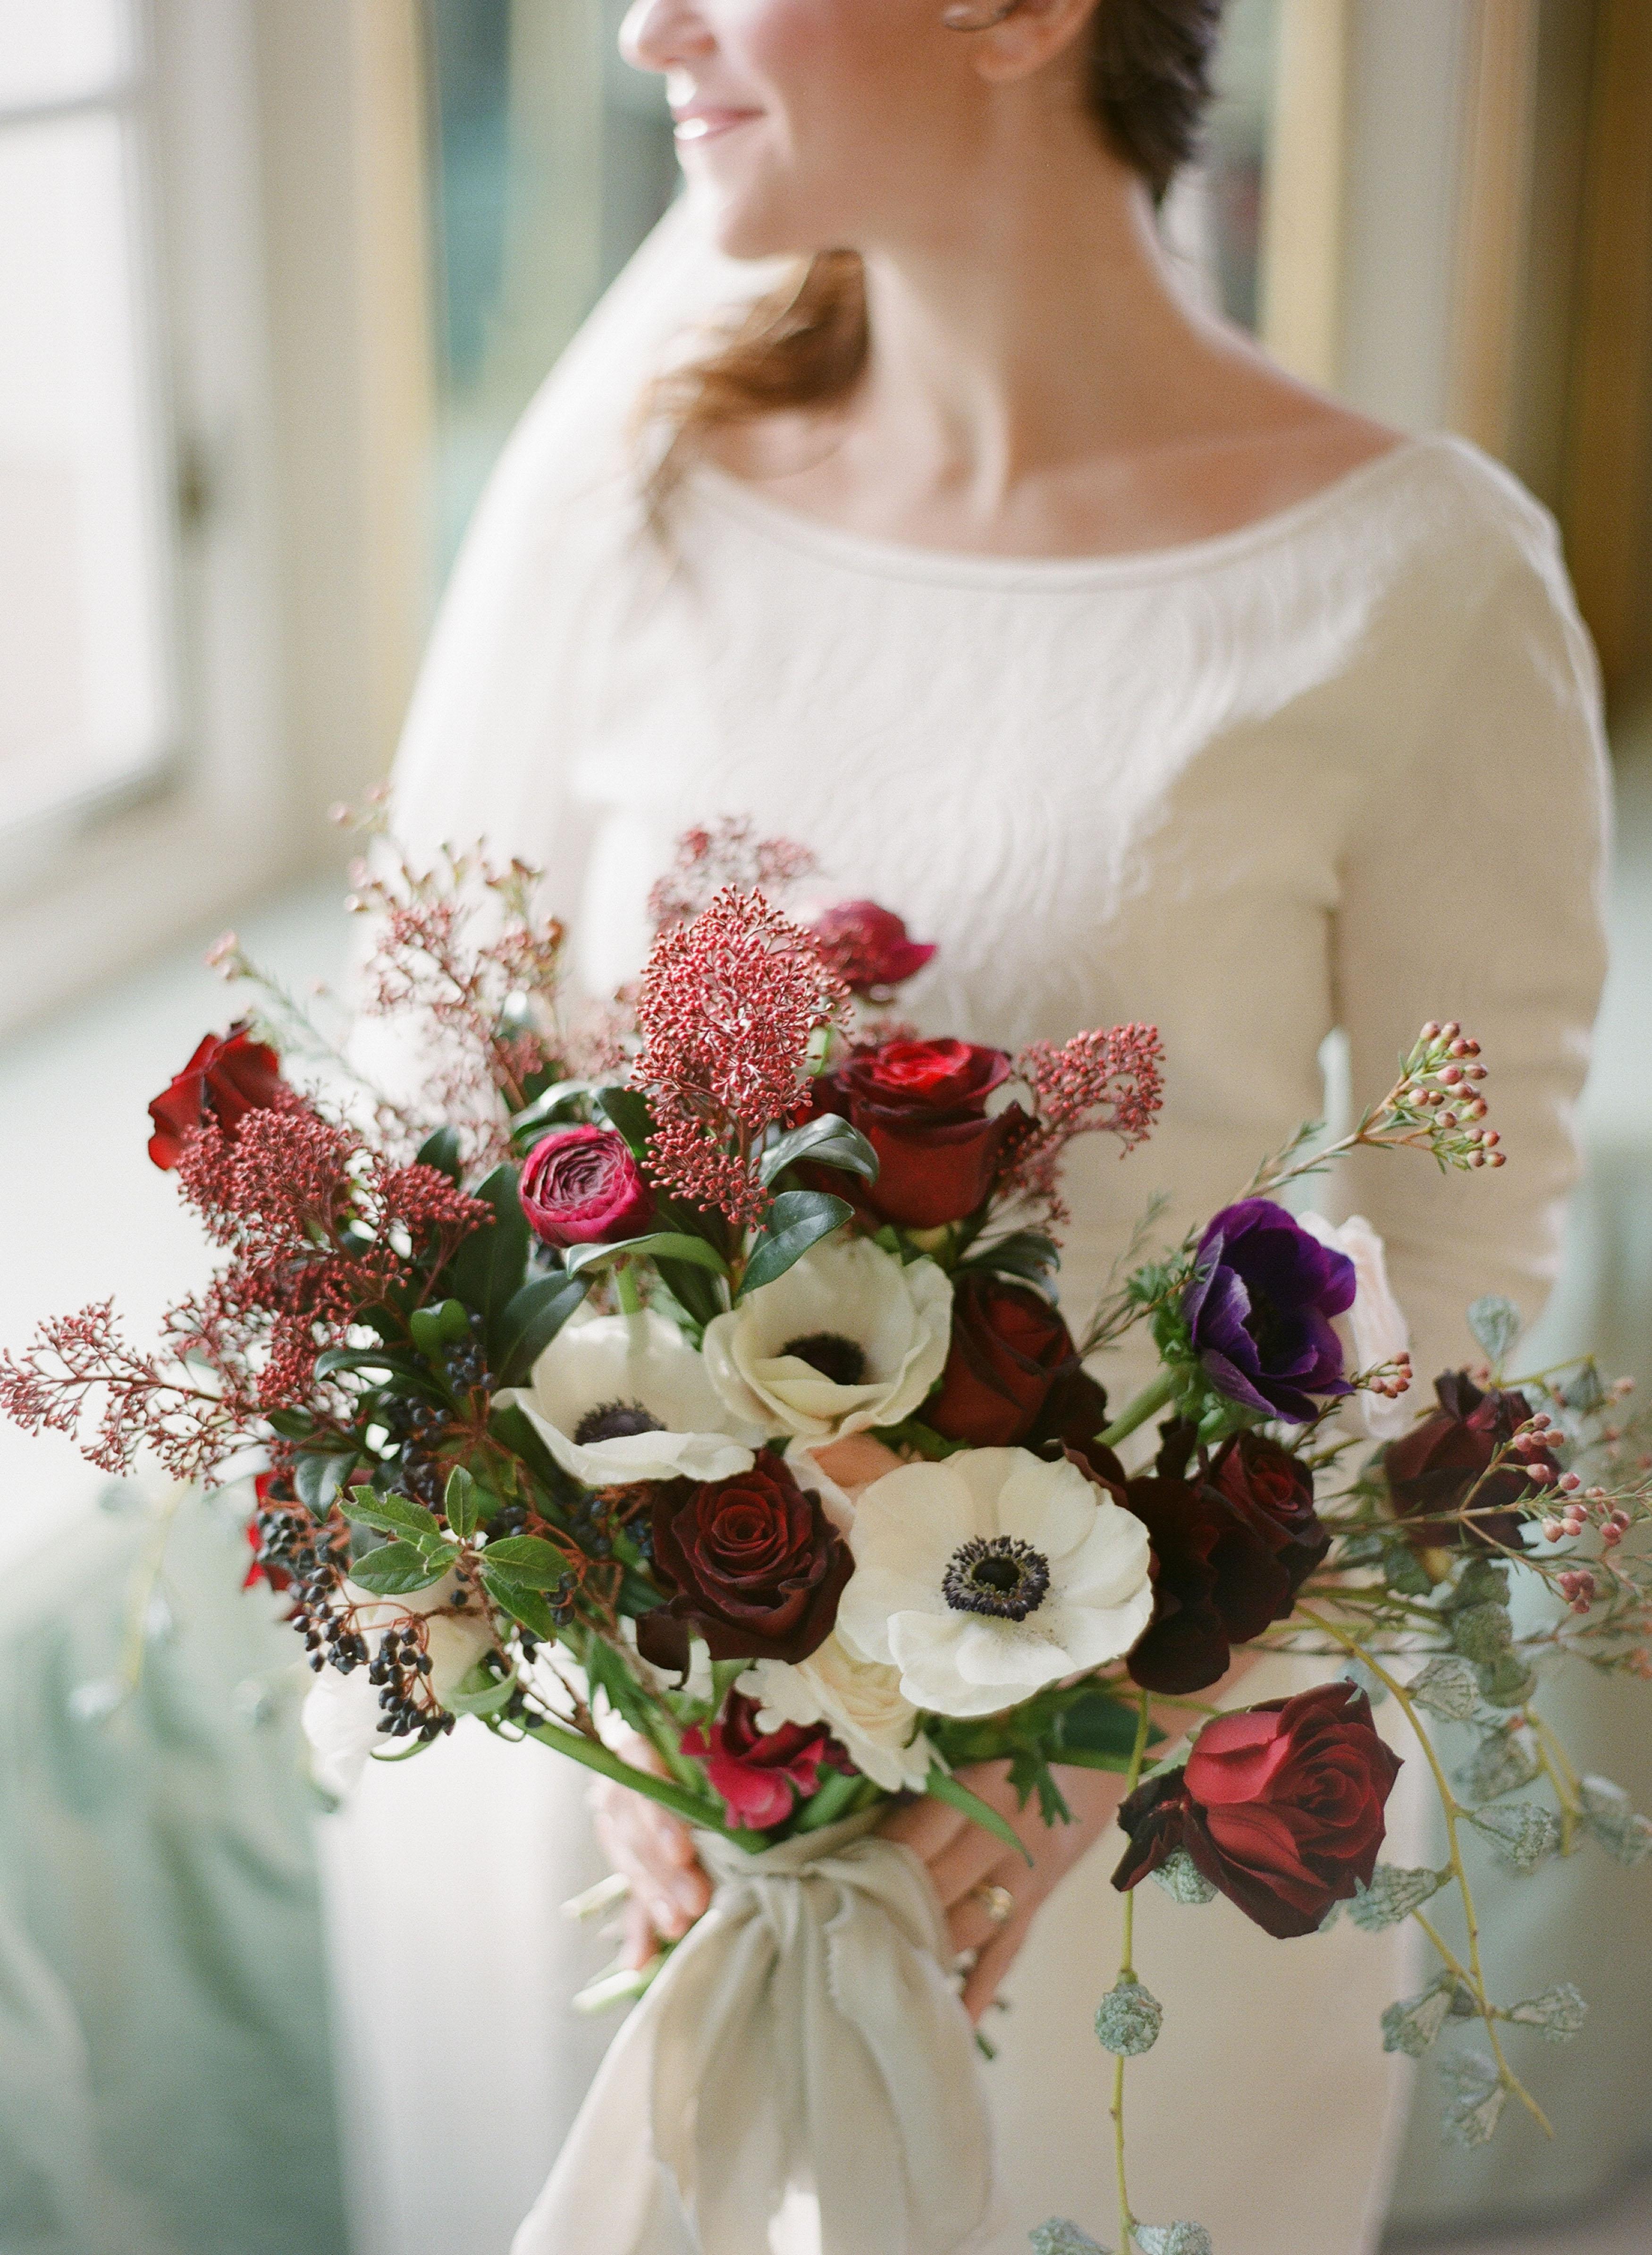 52 gorgeous winter wedding bouquets | martha stewart weddings